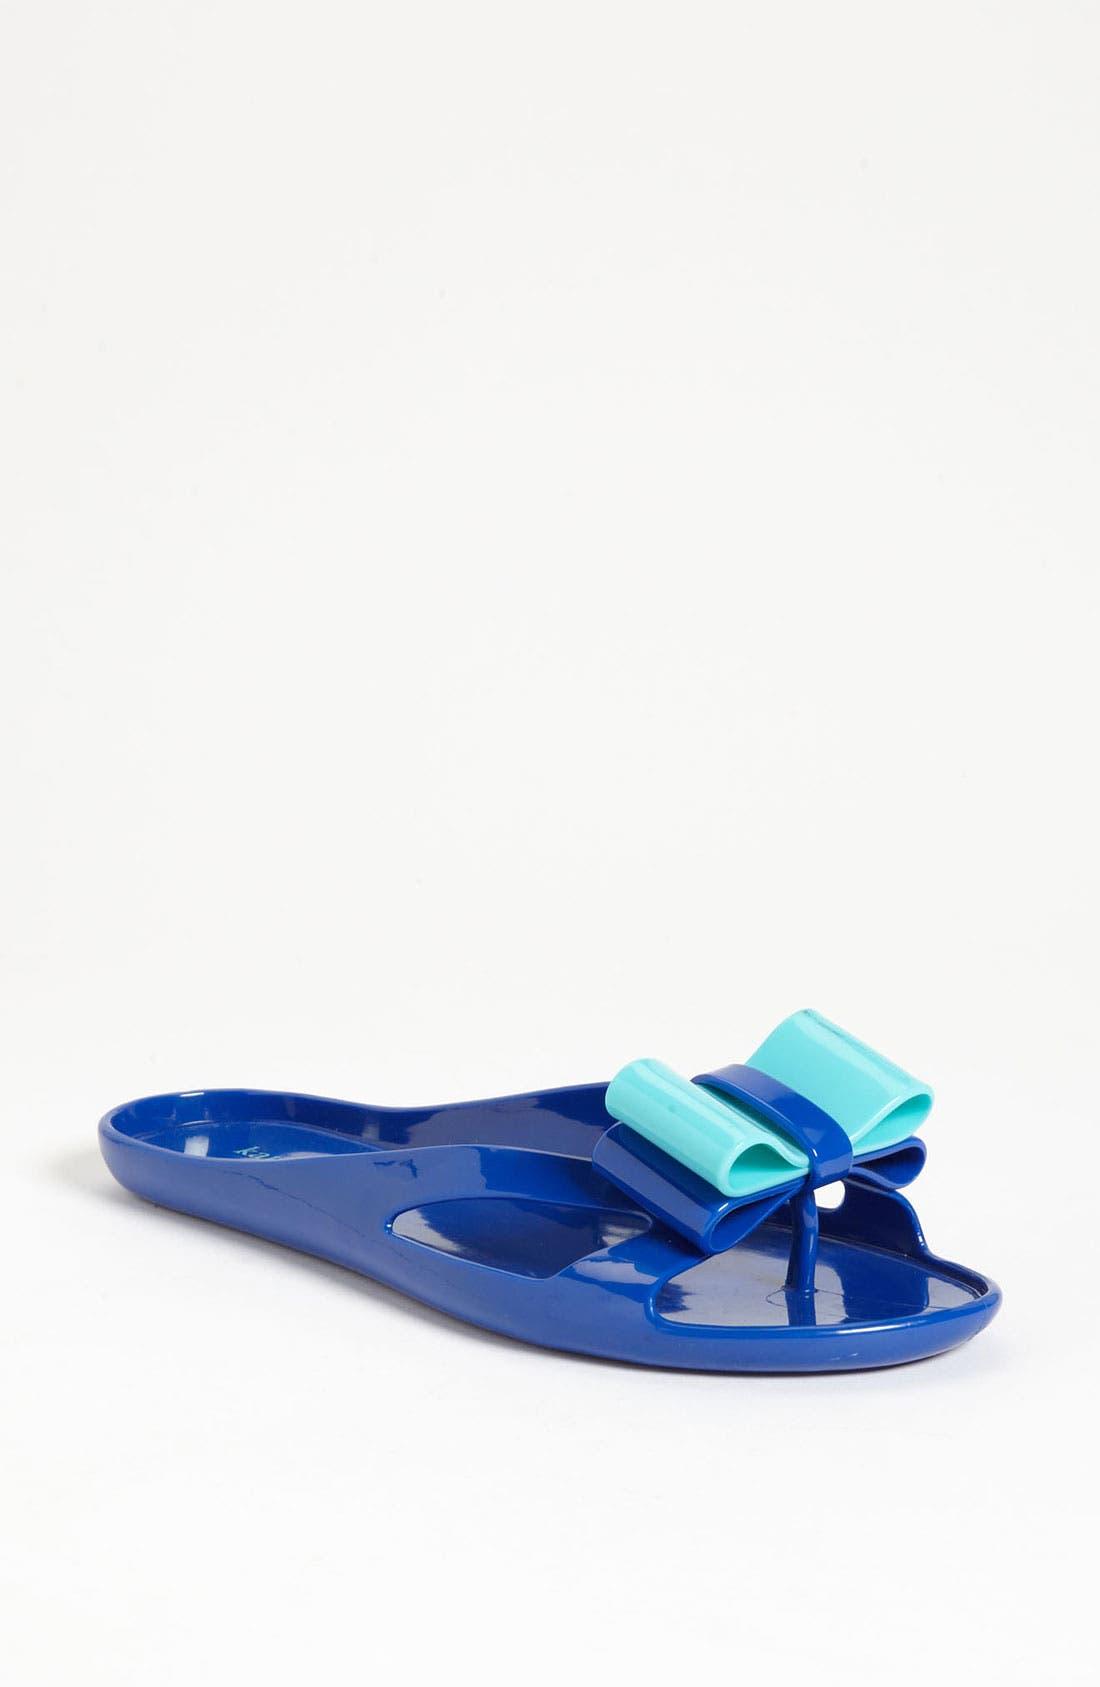 Alternate Image 1 Selected - kate spade new york 'bennie' sandal